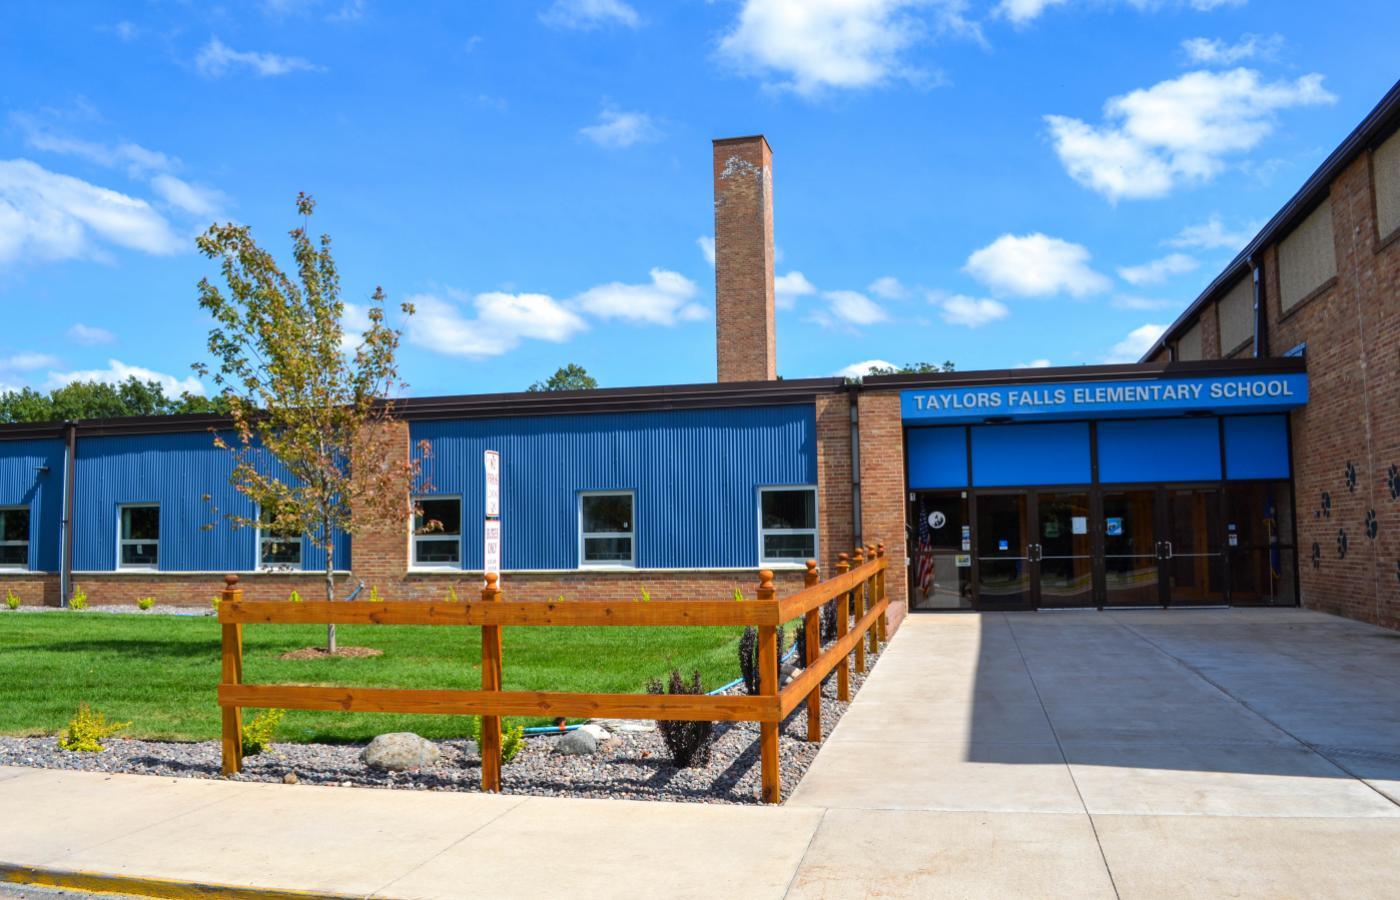 Taylors Falls Elementary